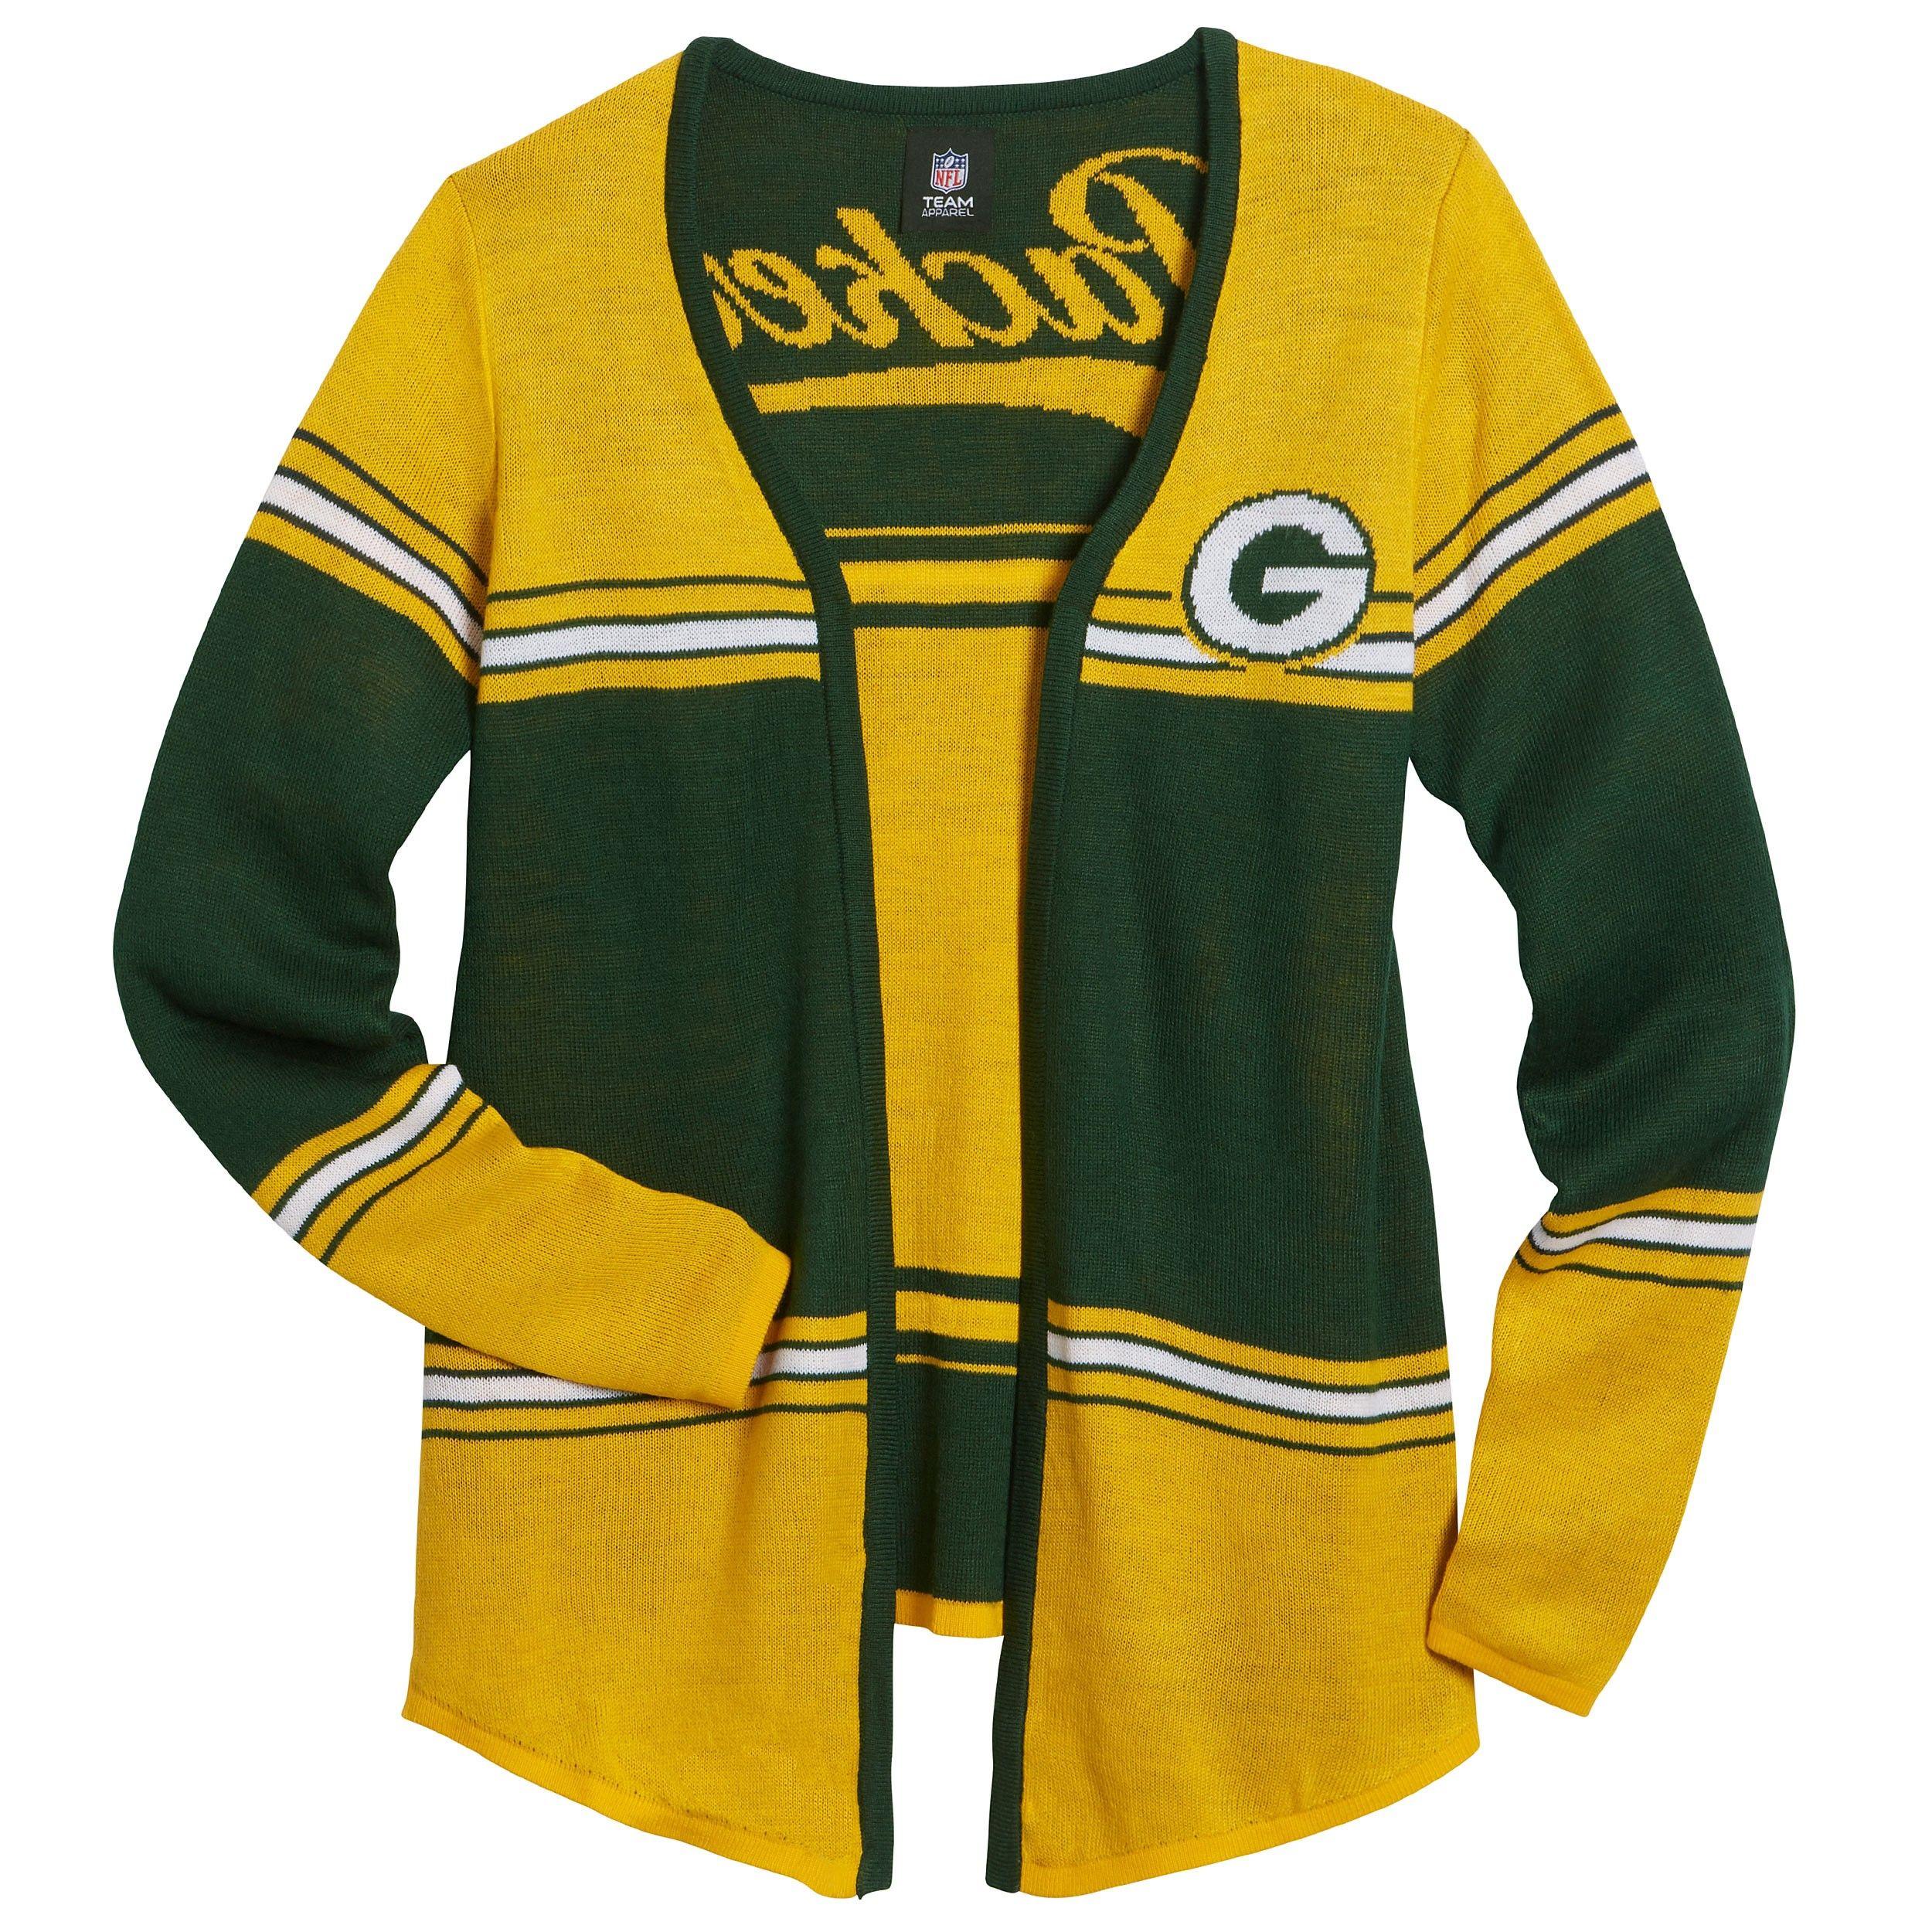 Green Bay Packers Women S Shrug Cardigan Green Bay Packers Clothing Green Bay Packers Crafts Green Bay Packers